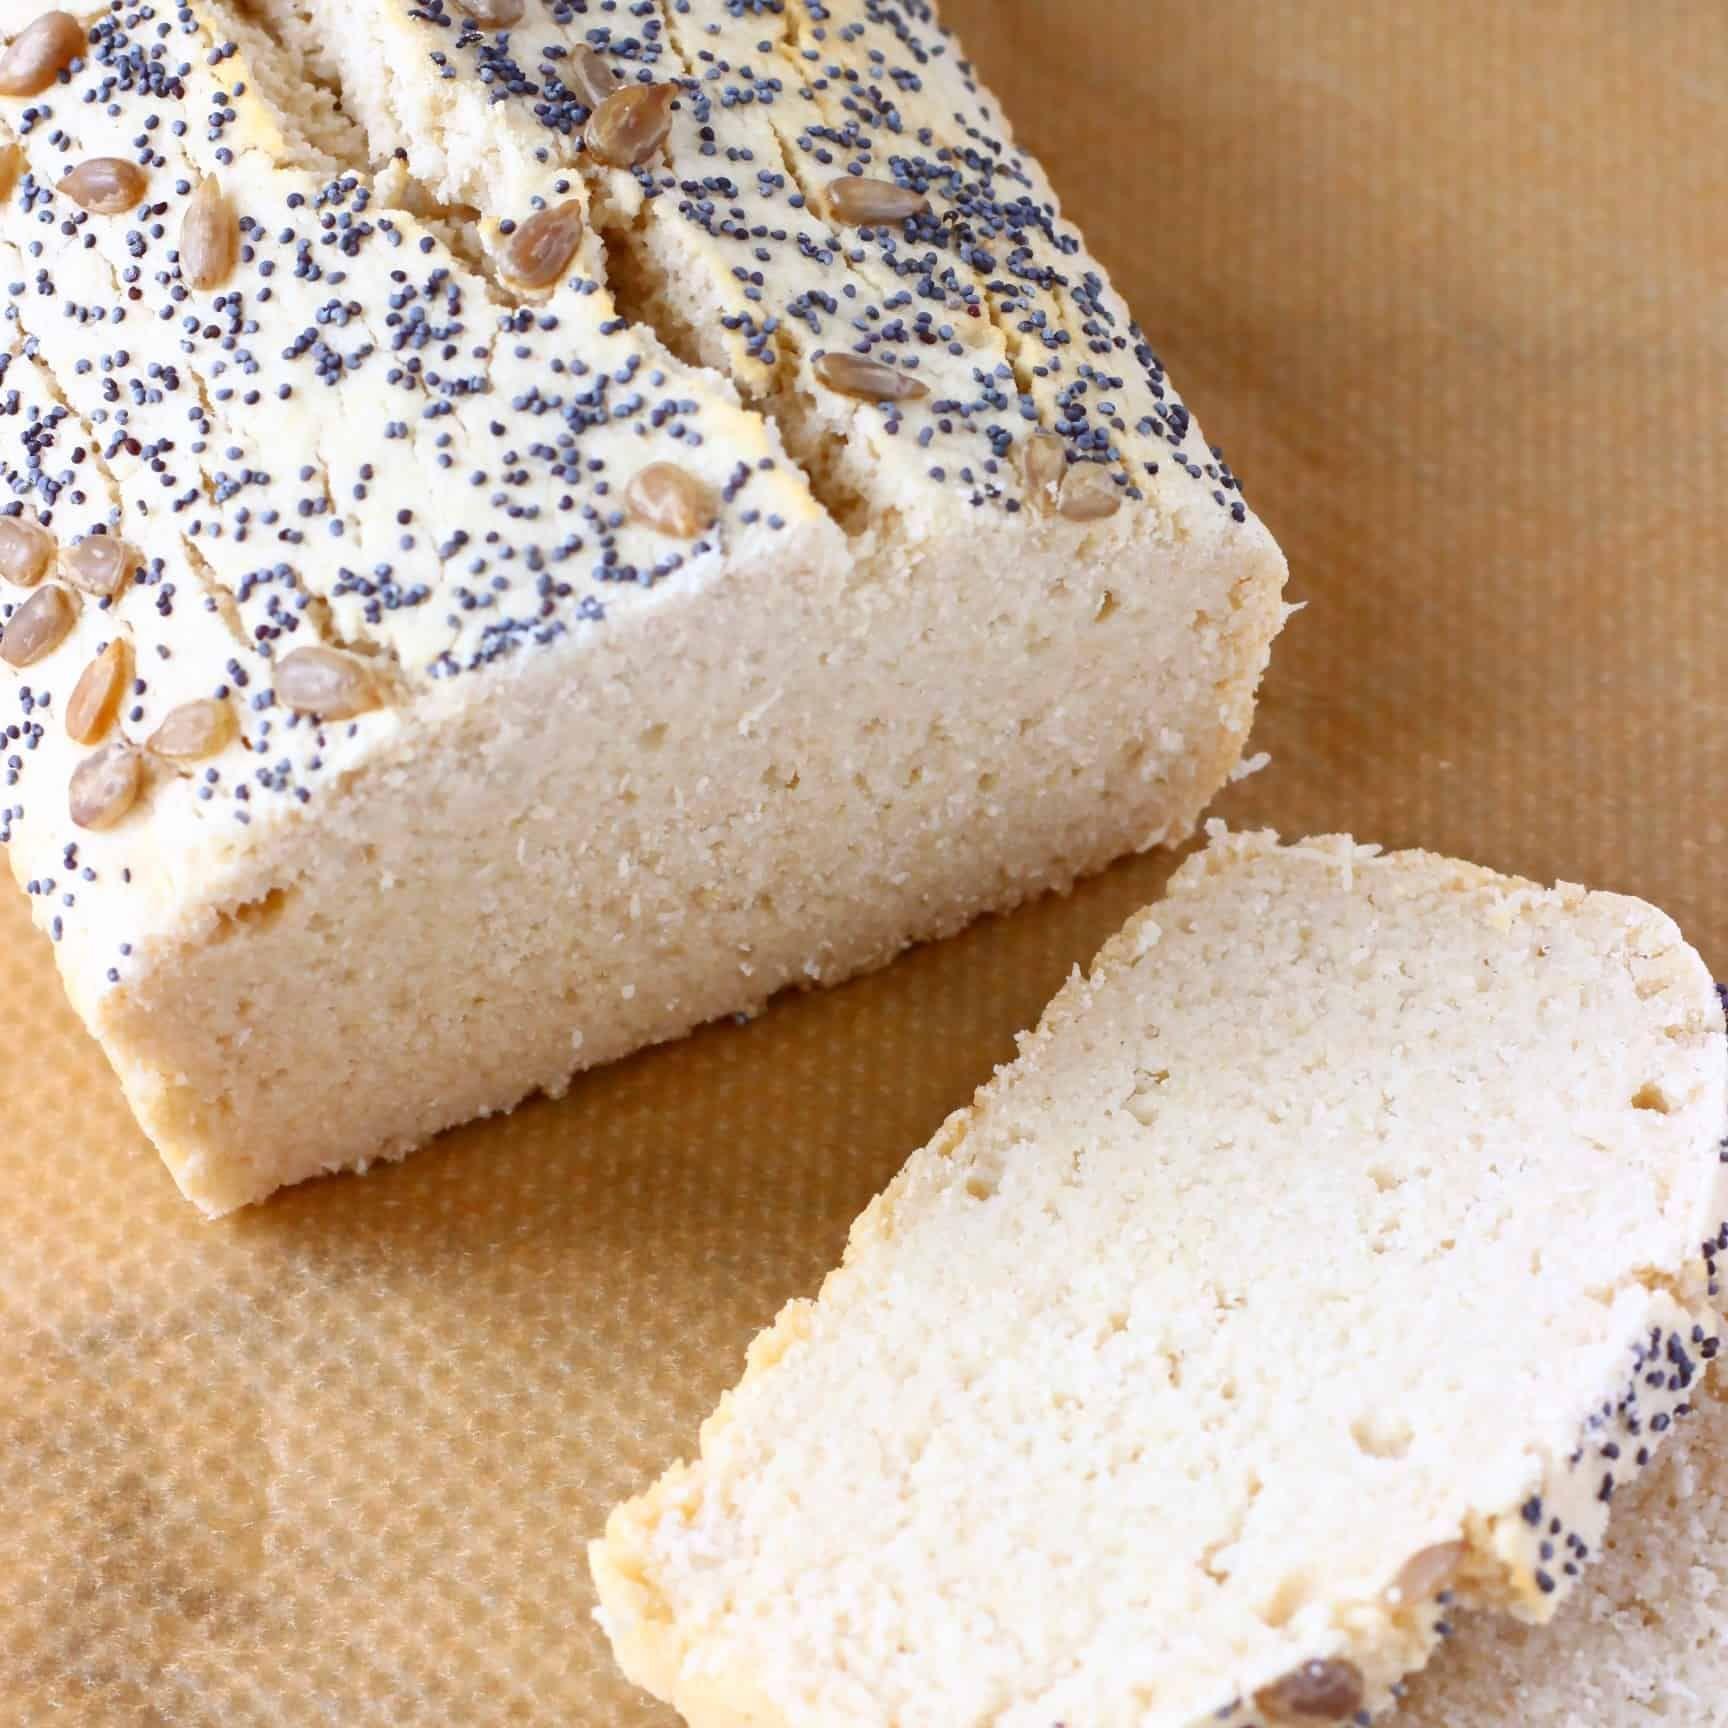 Gluten Free Rice Bread Vegan Gluten Free Vegan Bread Gluten Free Recipes Bread Rice Bread